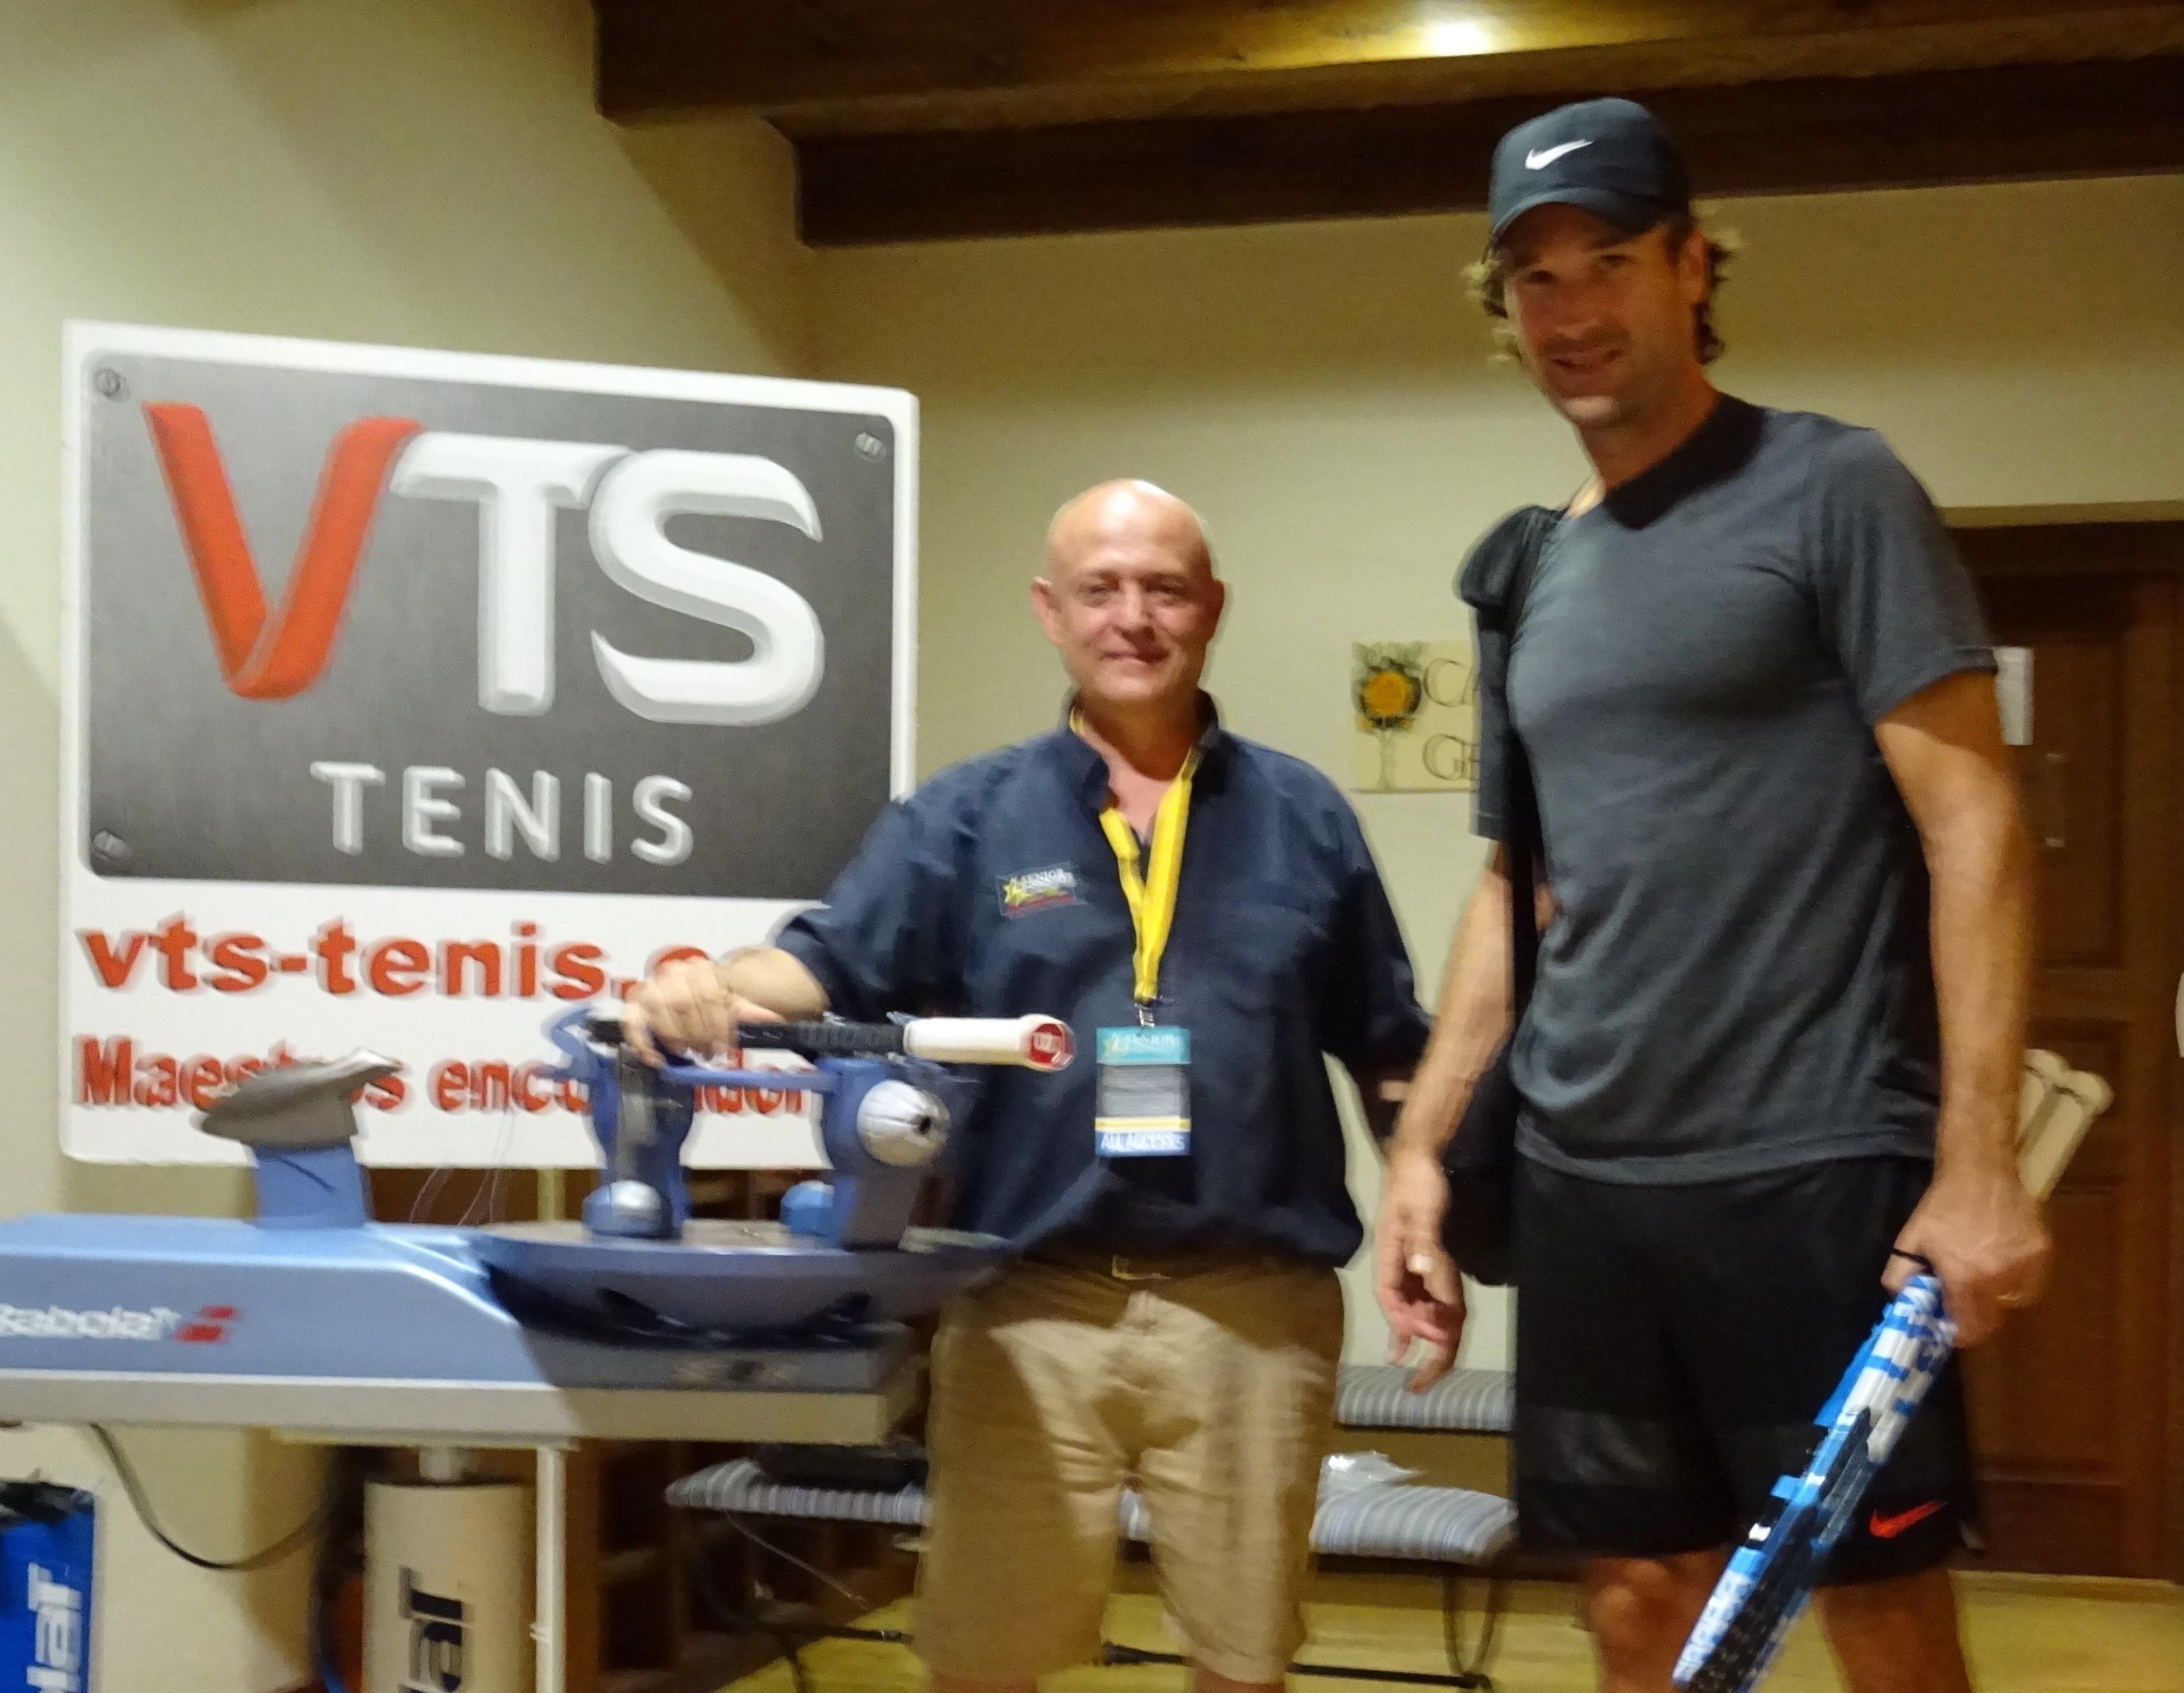 Vts Tenis